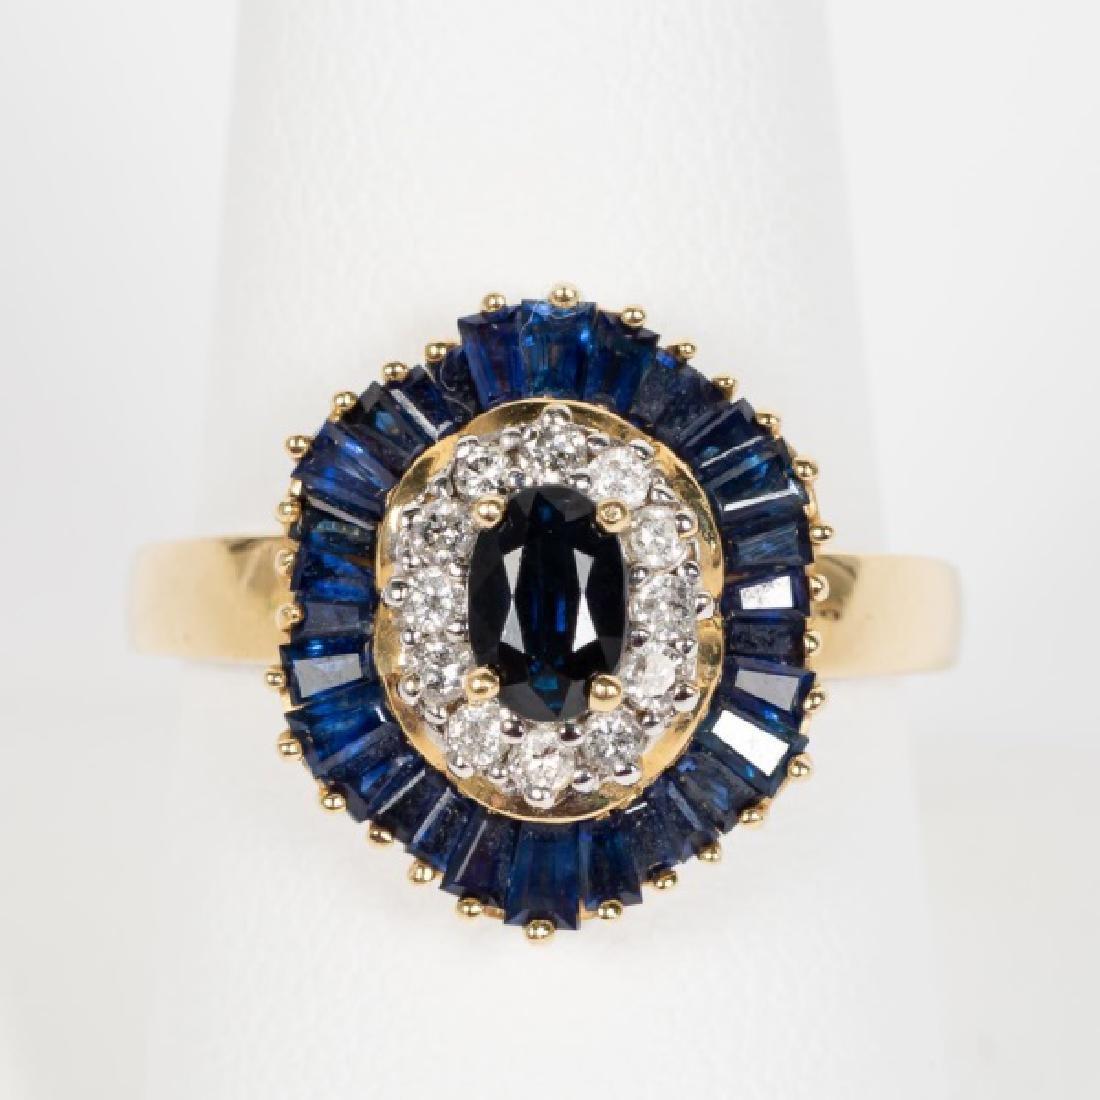 14k Yellow Gold, Sapphire, & Diamond Ring